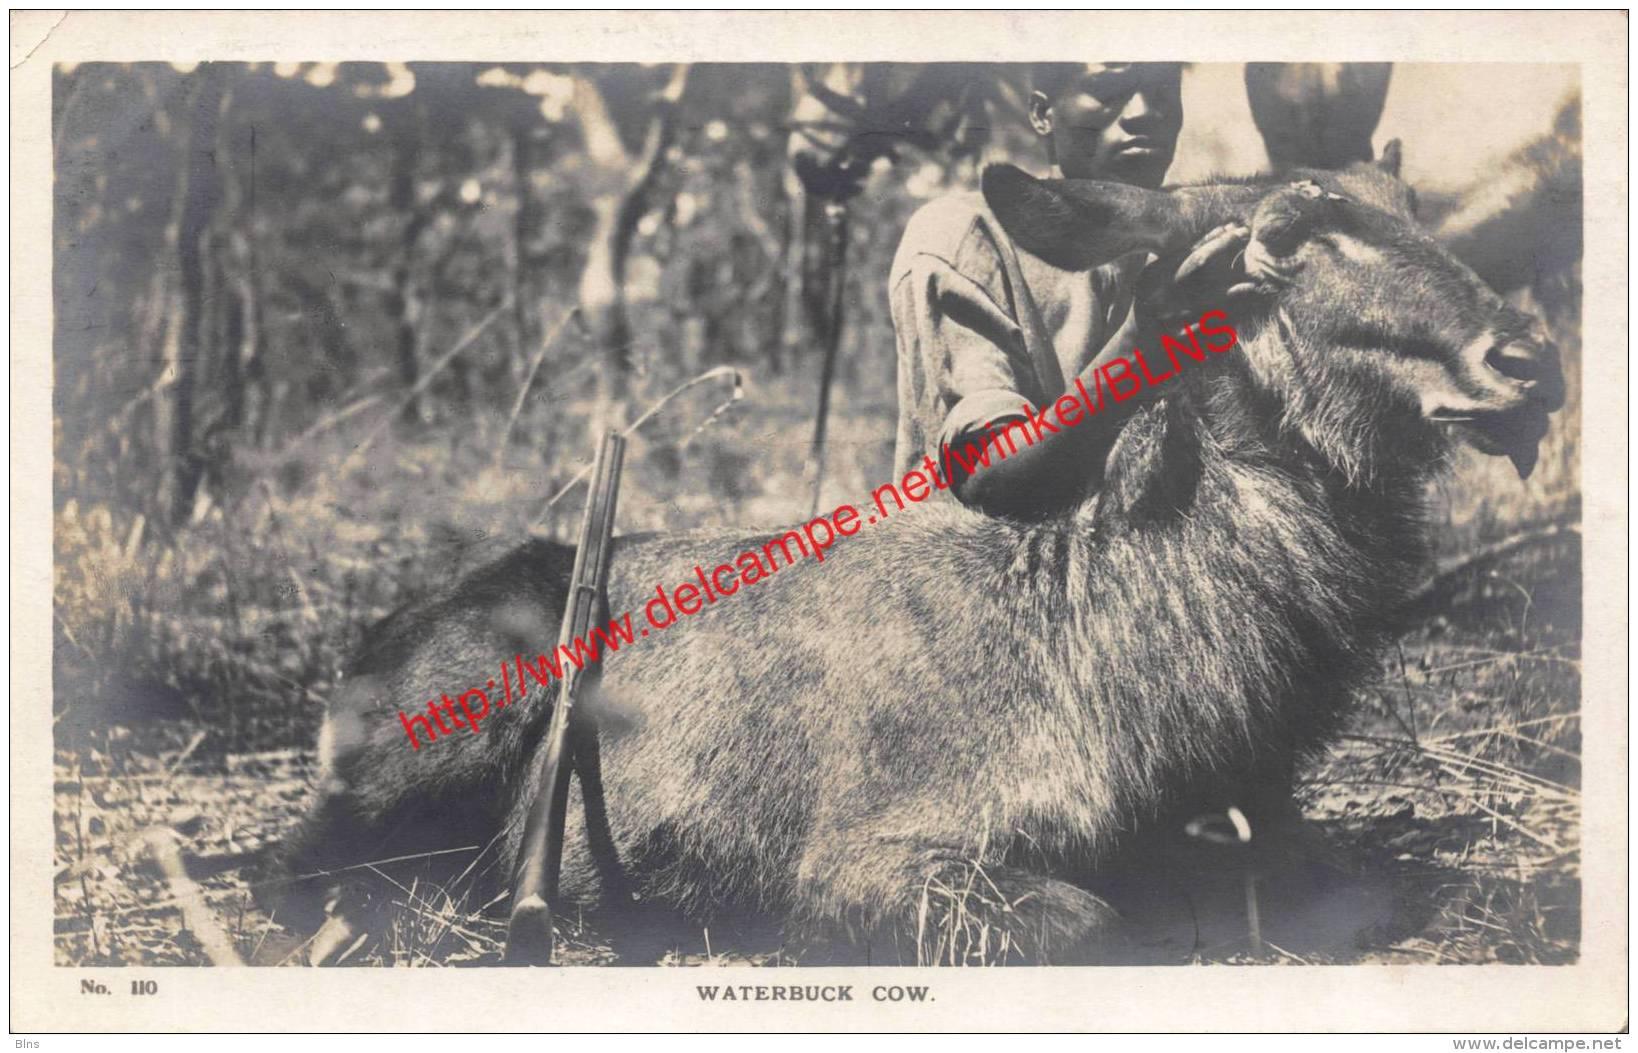 Waterbuck Cow - Rhodesia - Zimbabwe